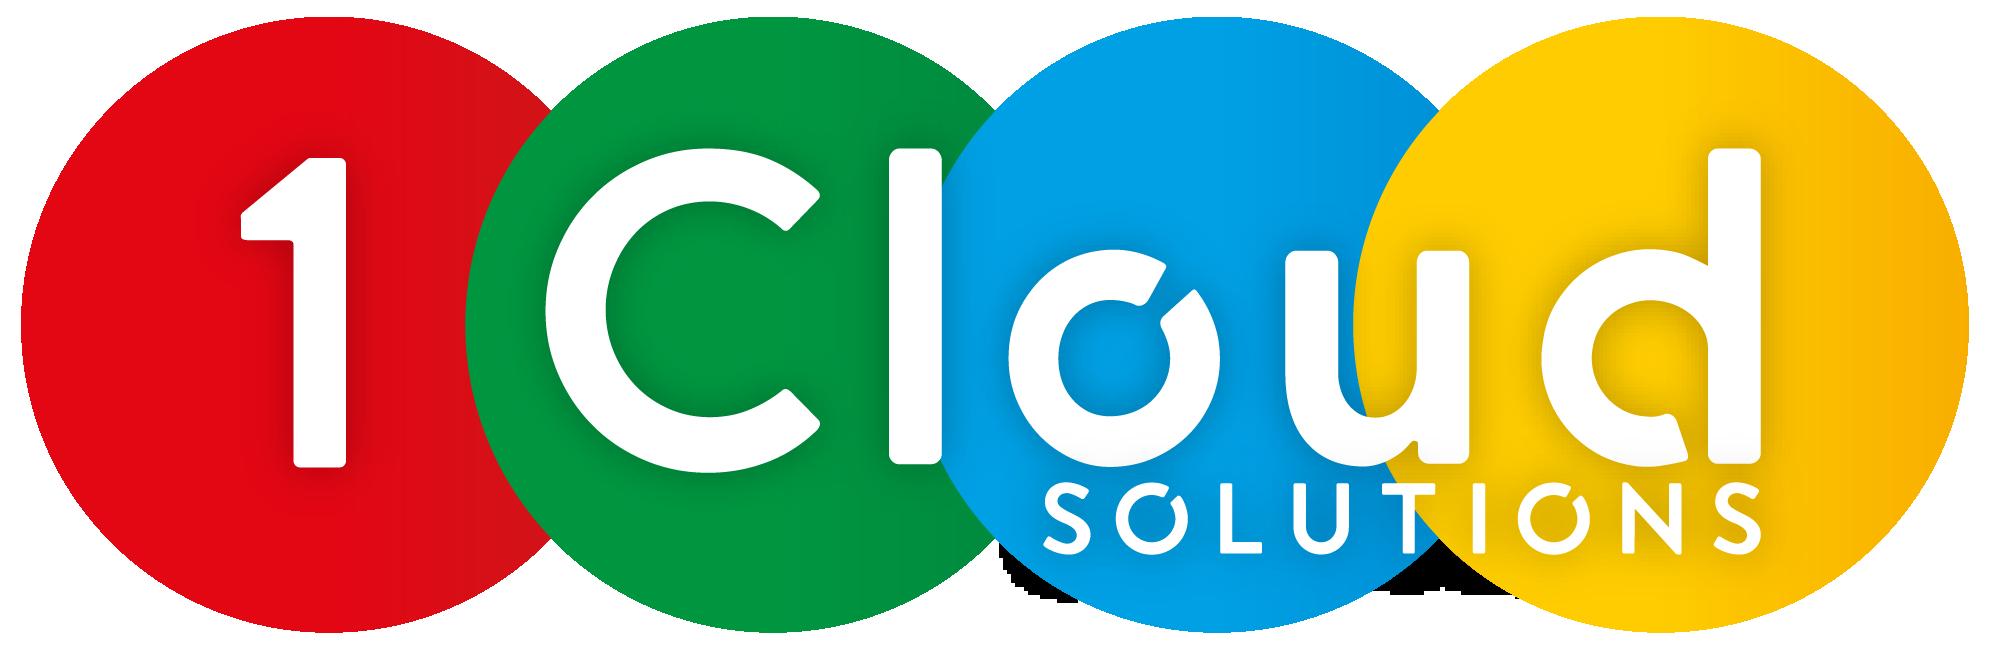 1 Cloud Solutions Logo